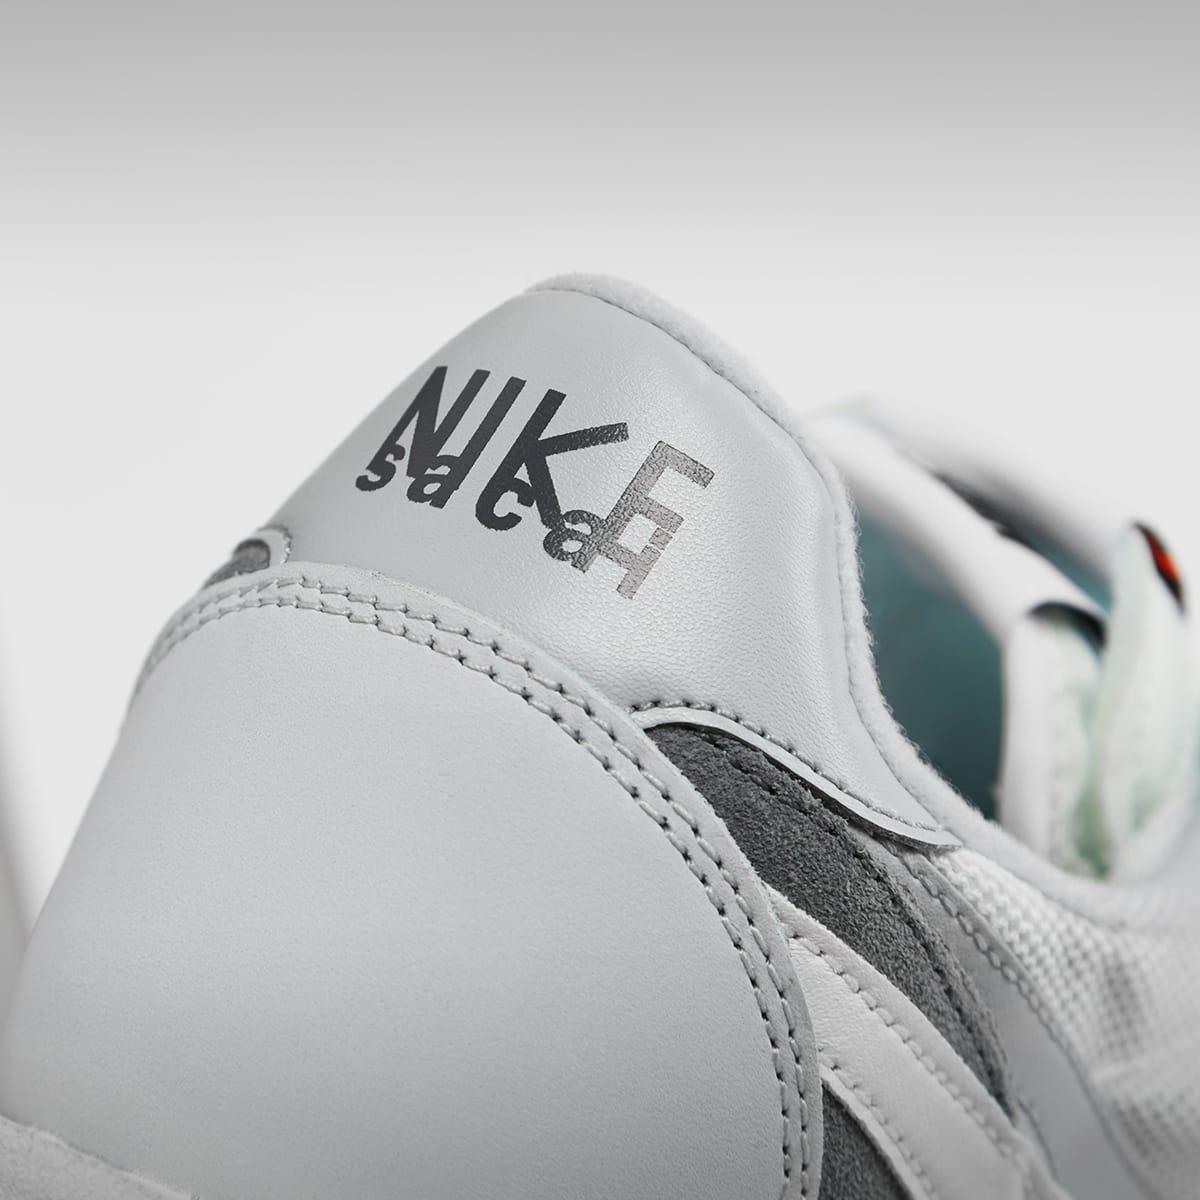 Nike x Sacai LDWaffle - BV0073-100